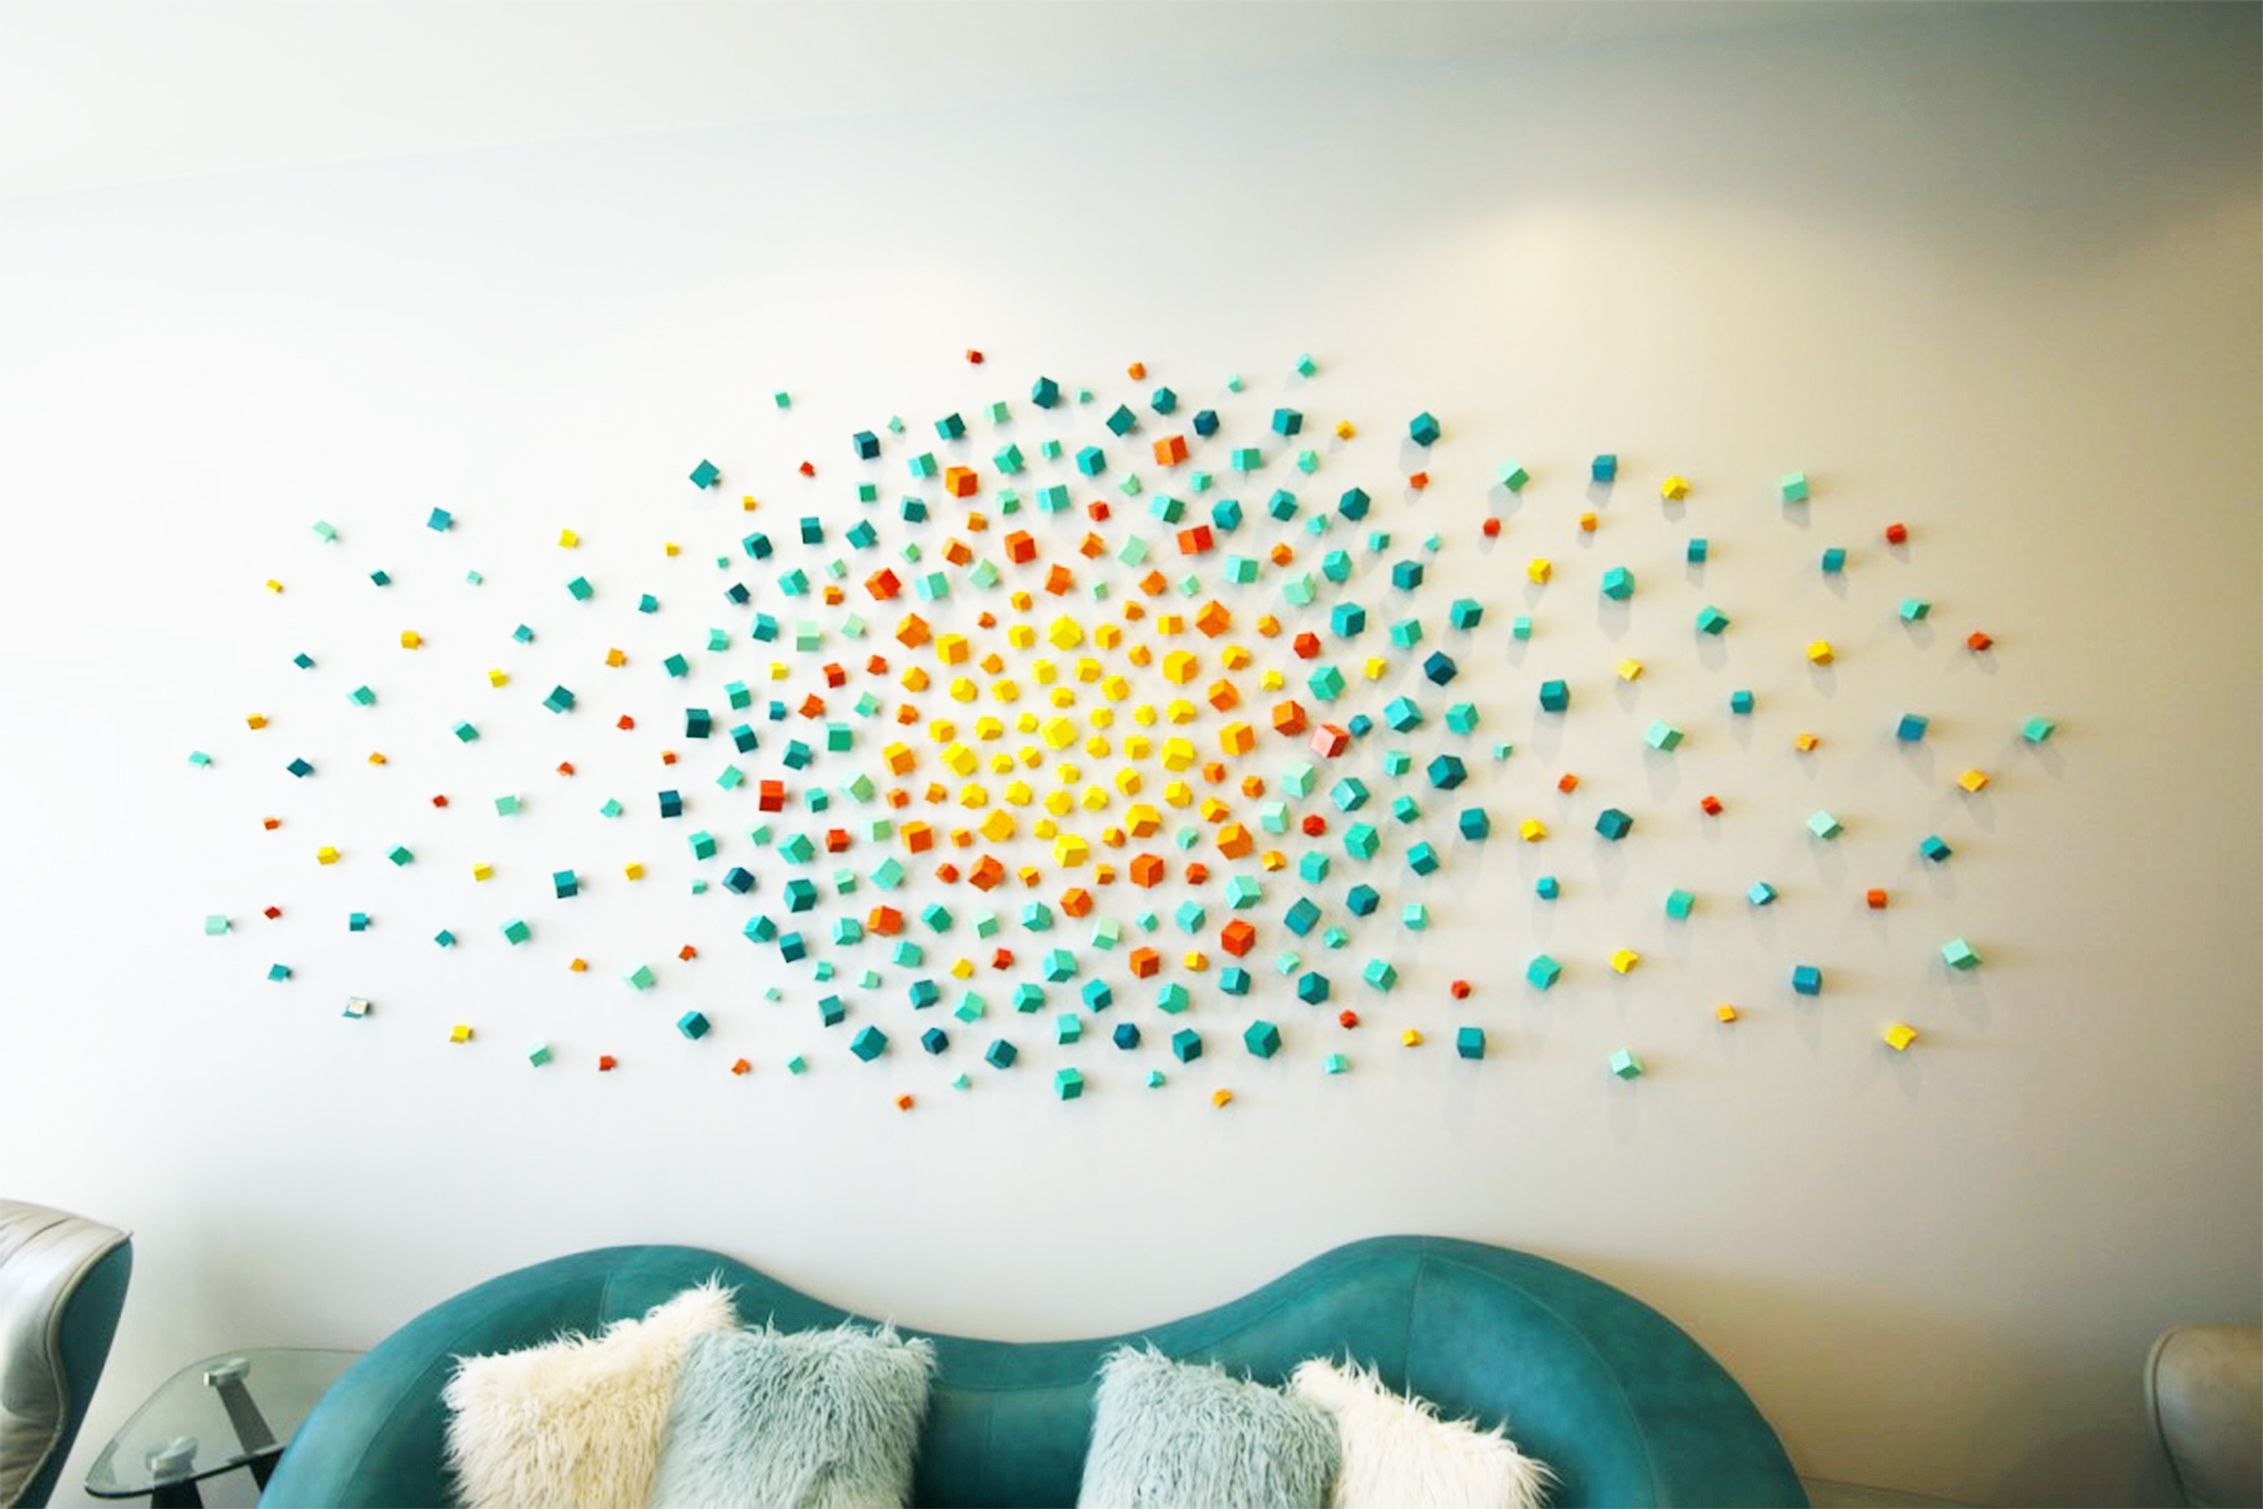 Lobby Art   Commercial Office Wall Art   3D Installation Art   Rosemary  Pierce Modern Art